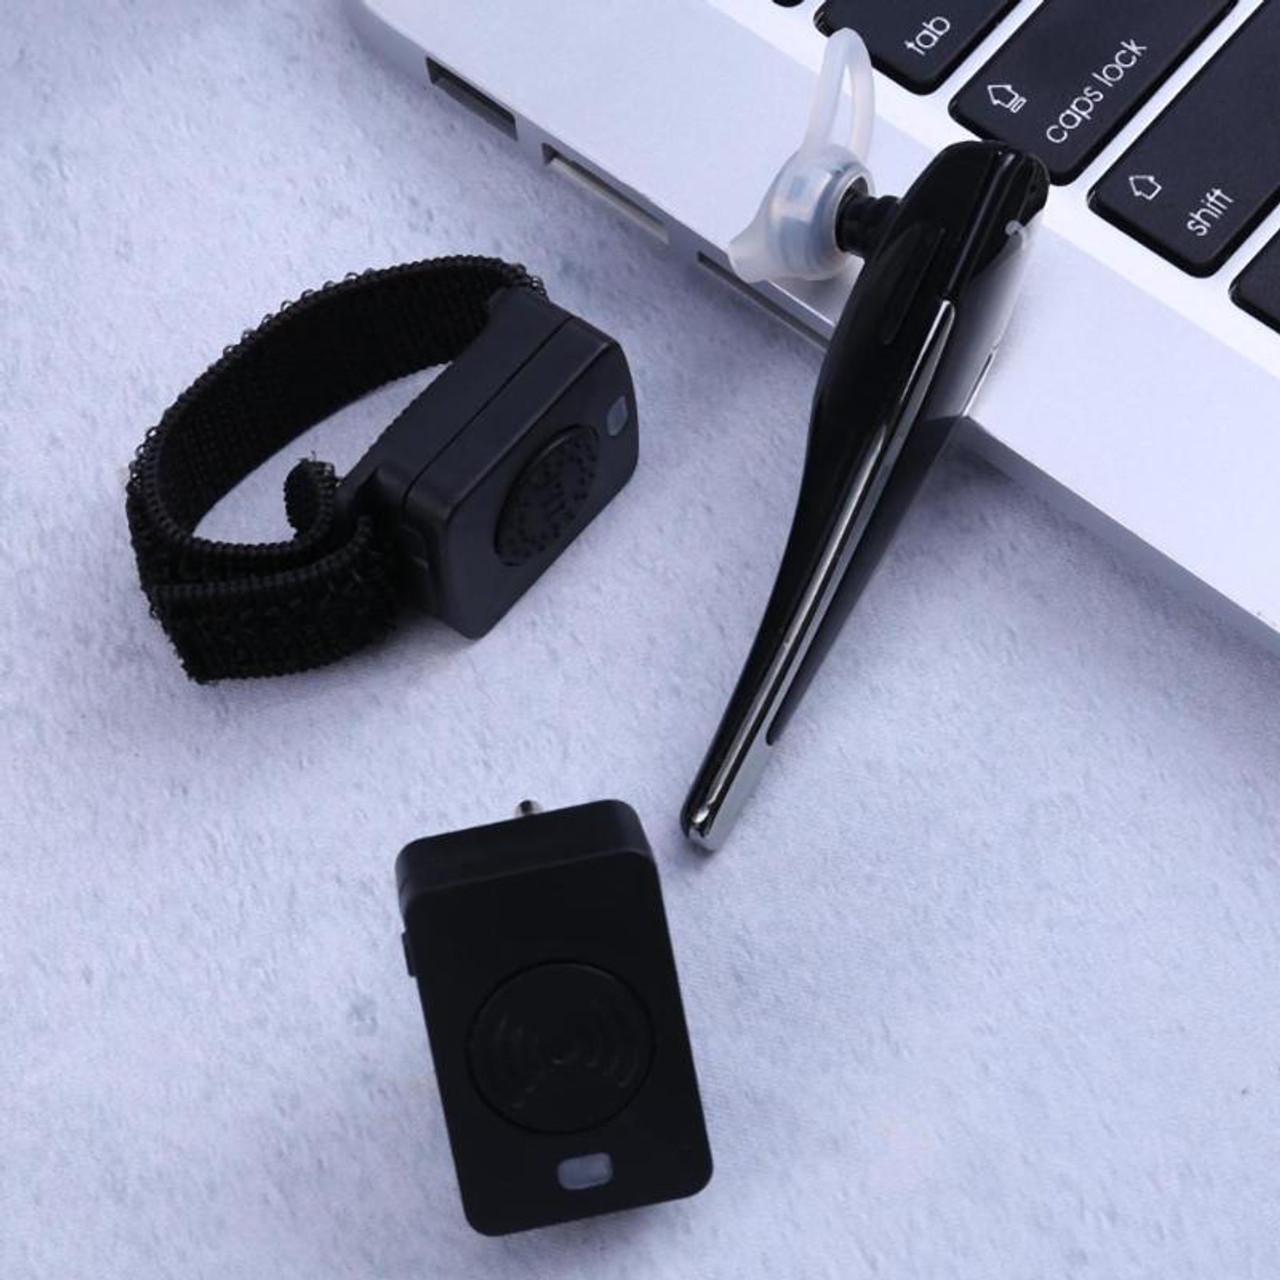 Wireless Bluetooth Handsfree K Type Earphone Handheld 2 Way Wireless ...